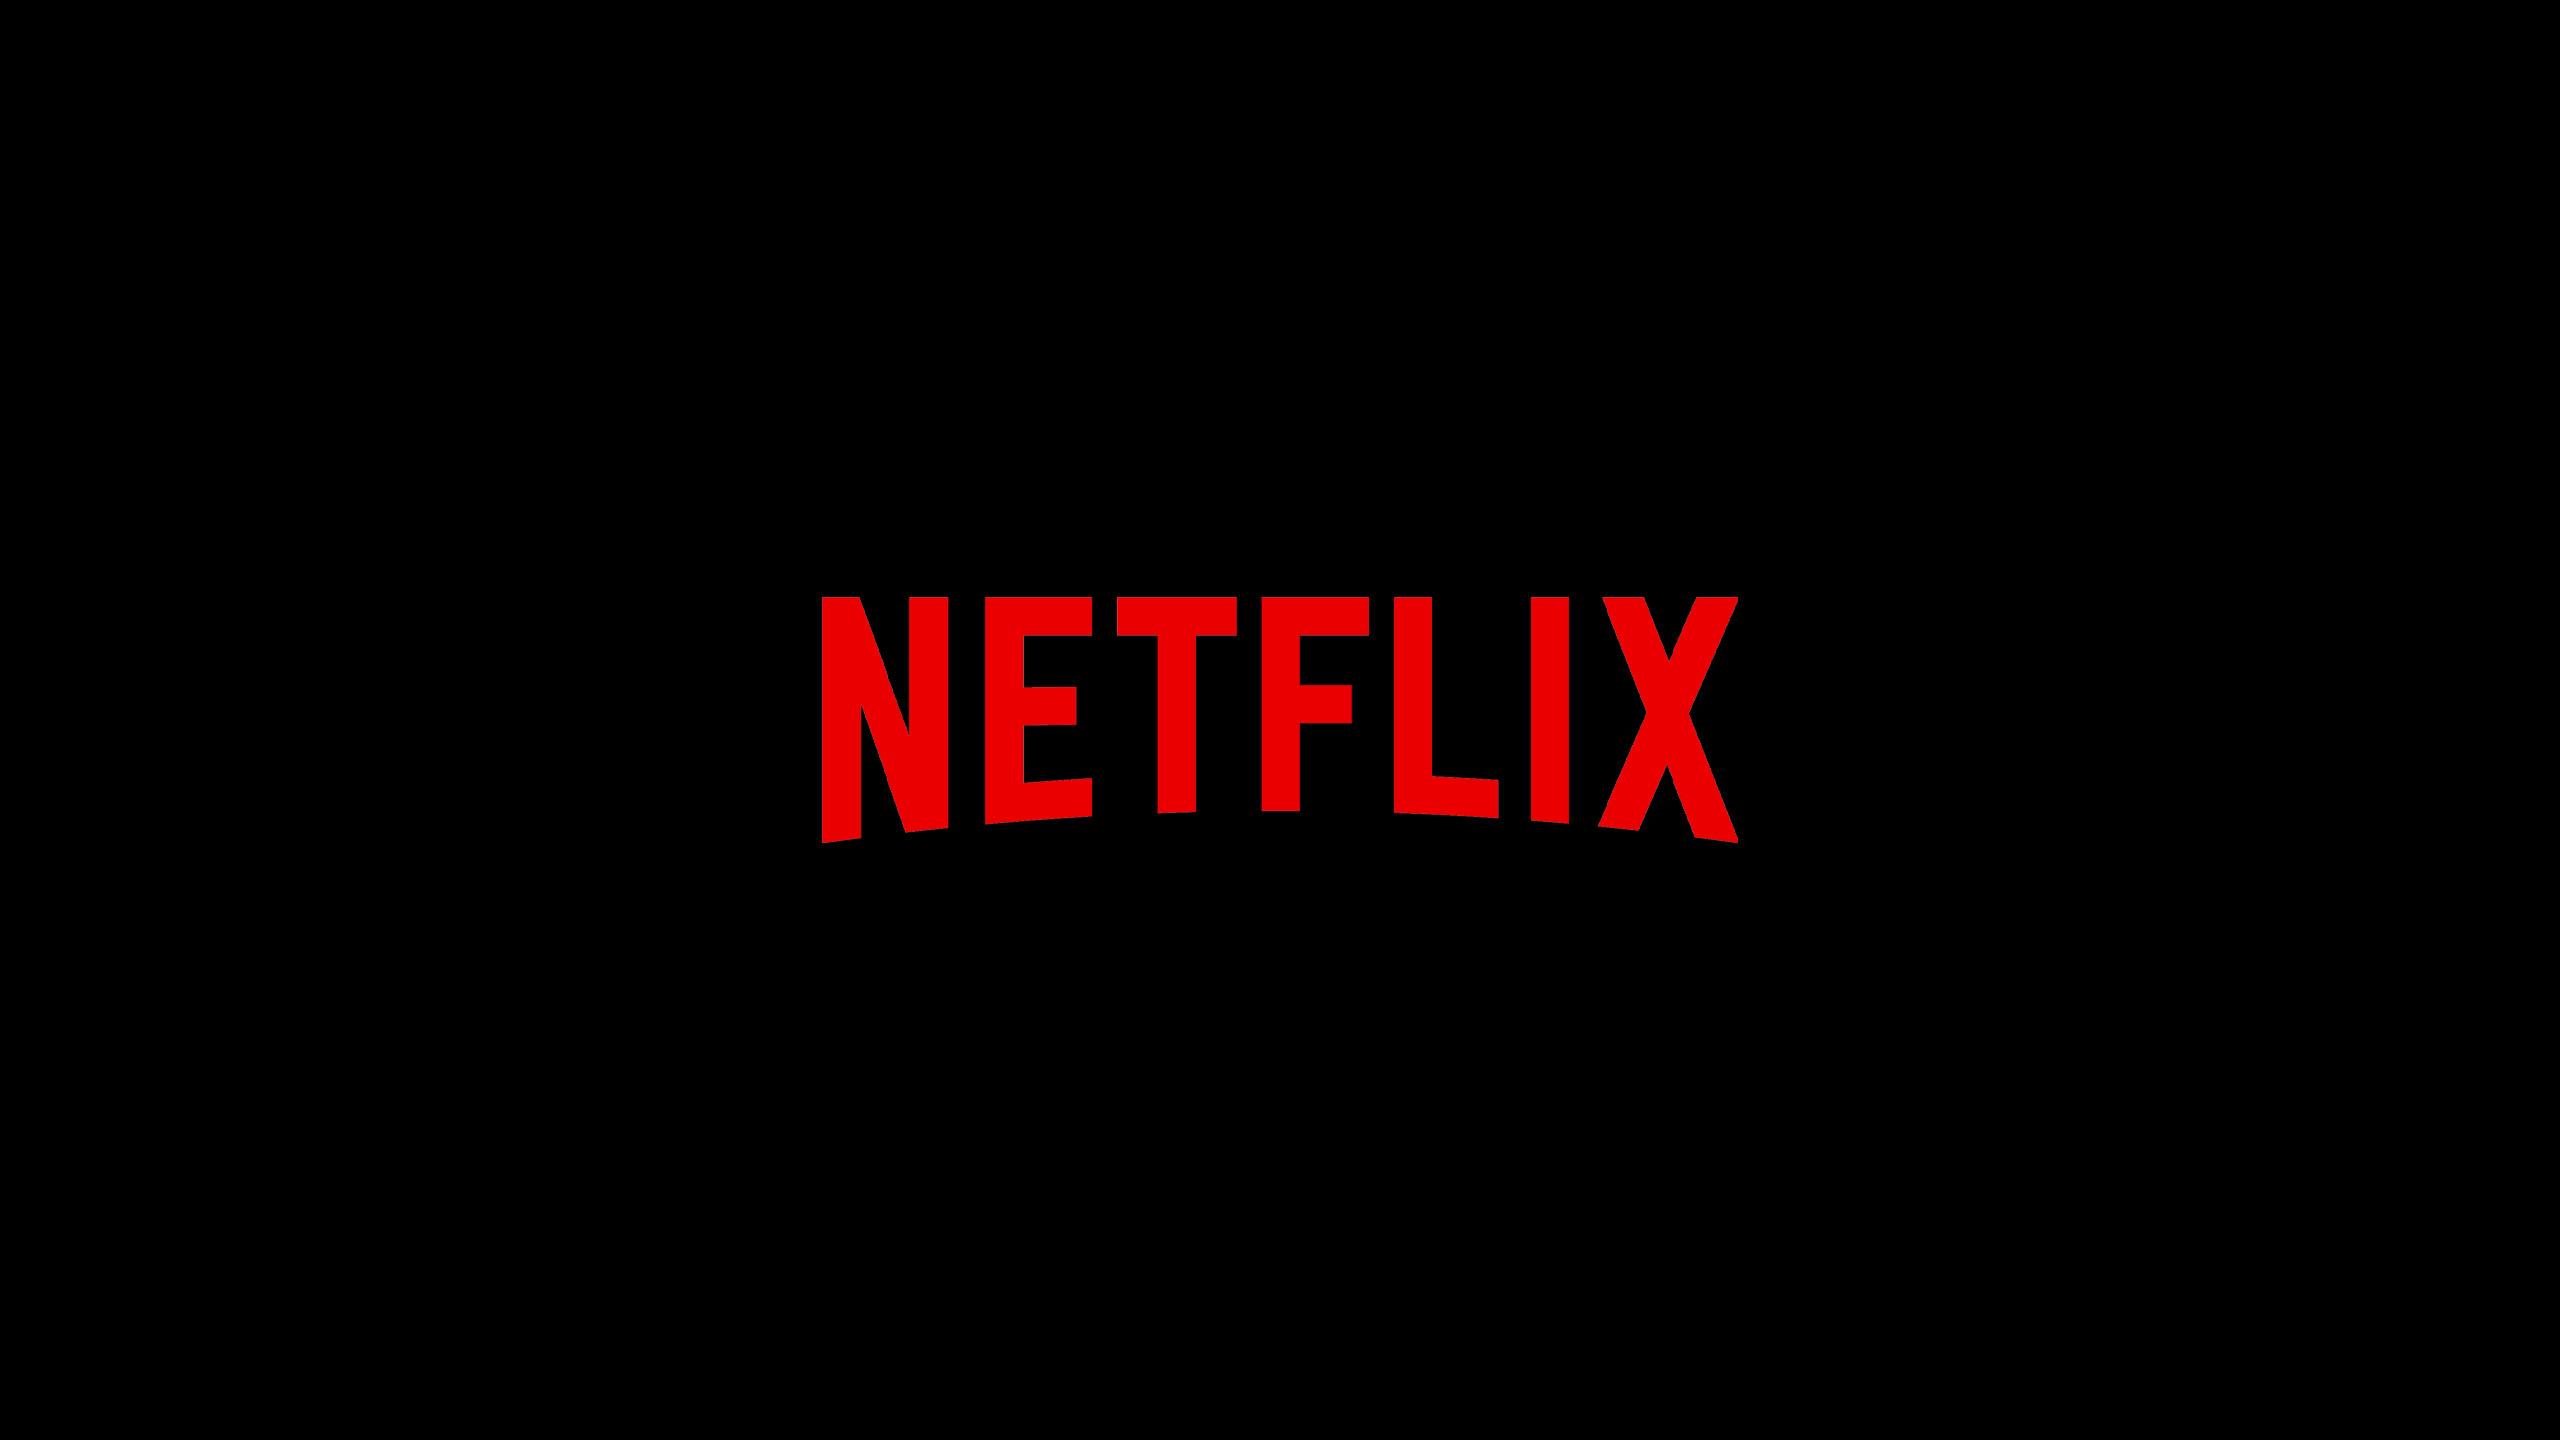 Actors & Actress' Wanted for New Netflix Pilot